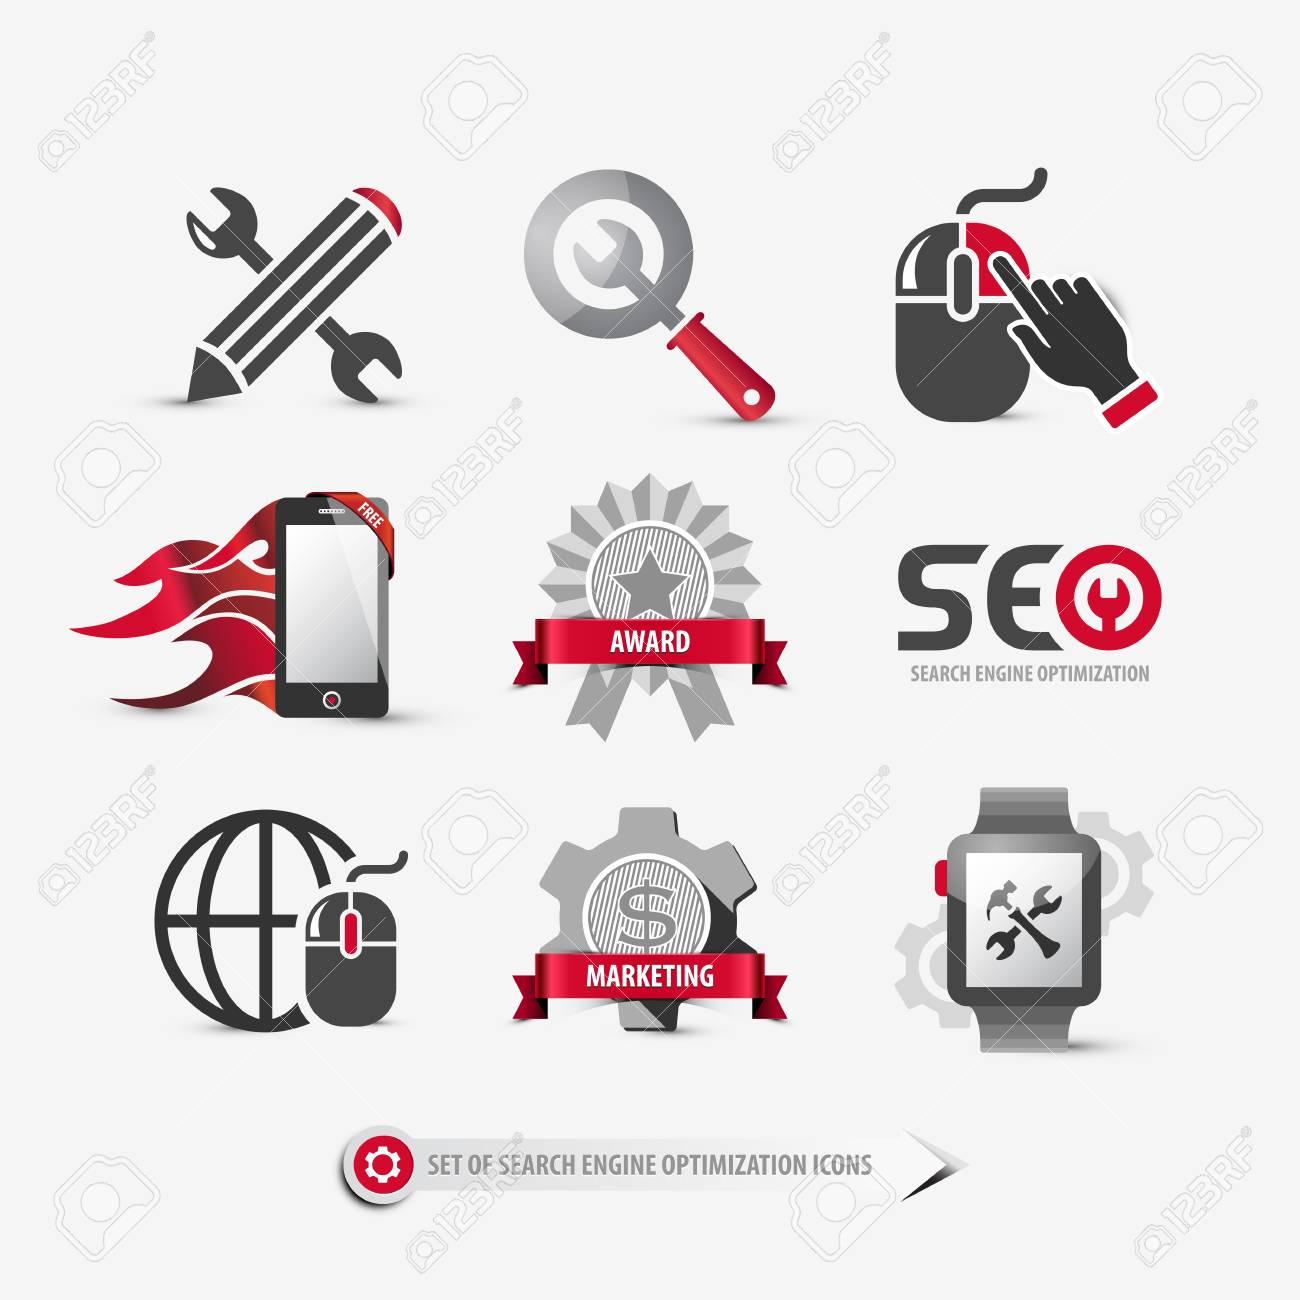 set of seo icons containing: search engine optimization symbols,